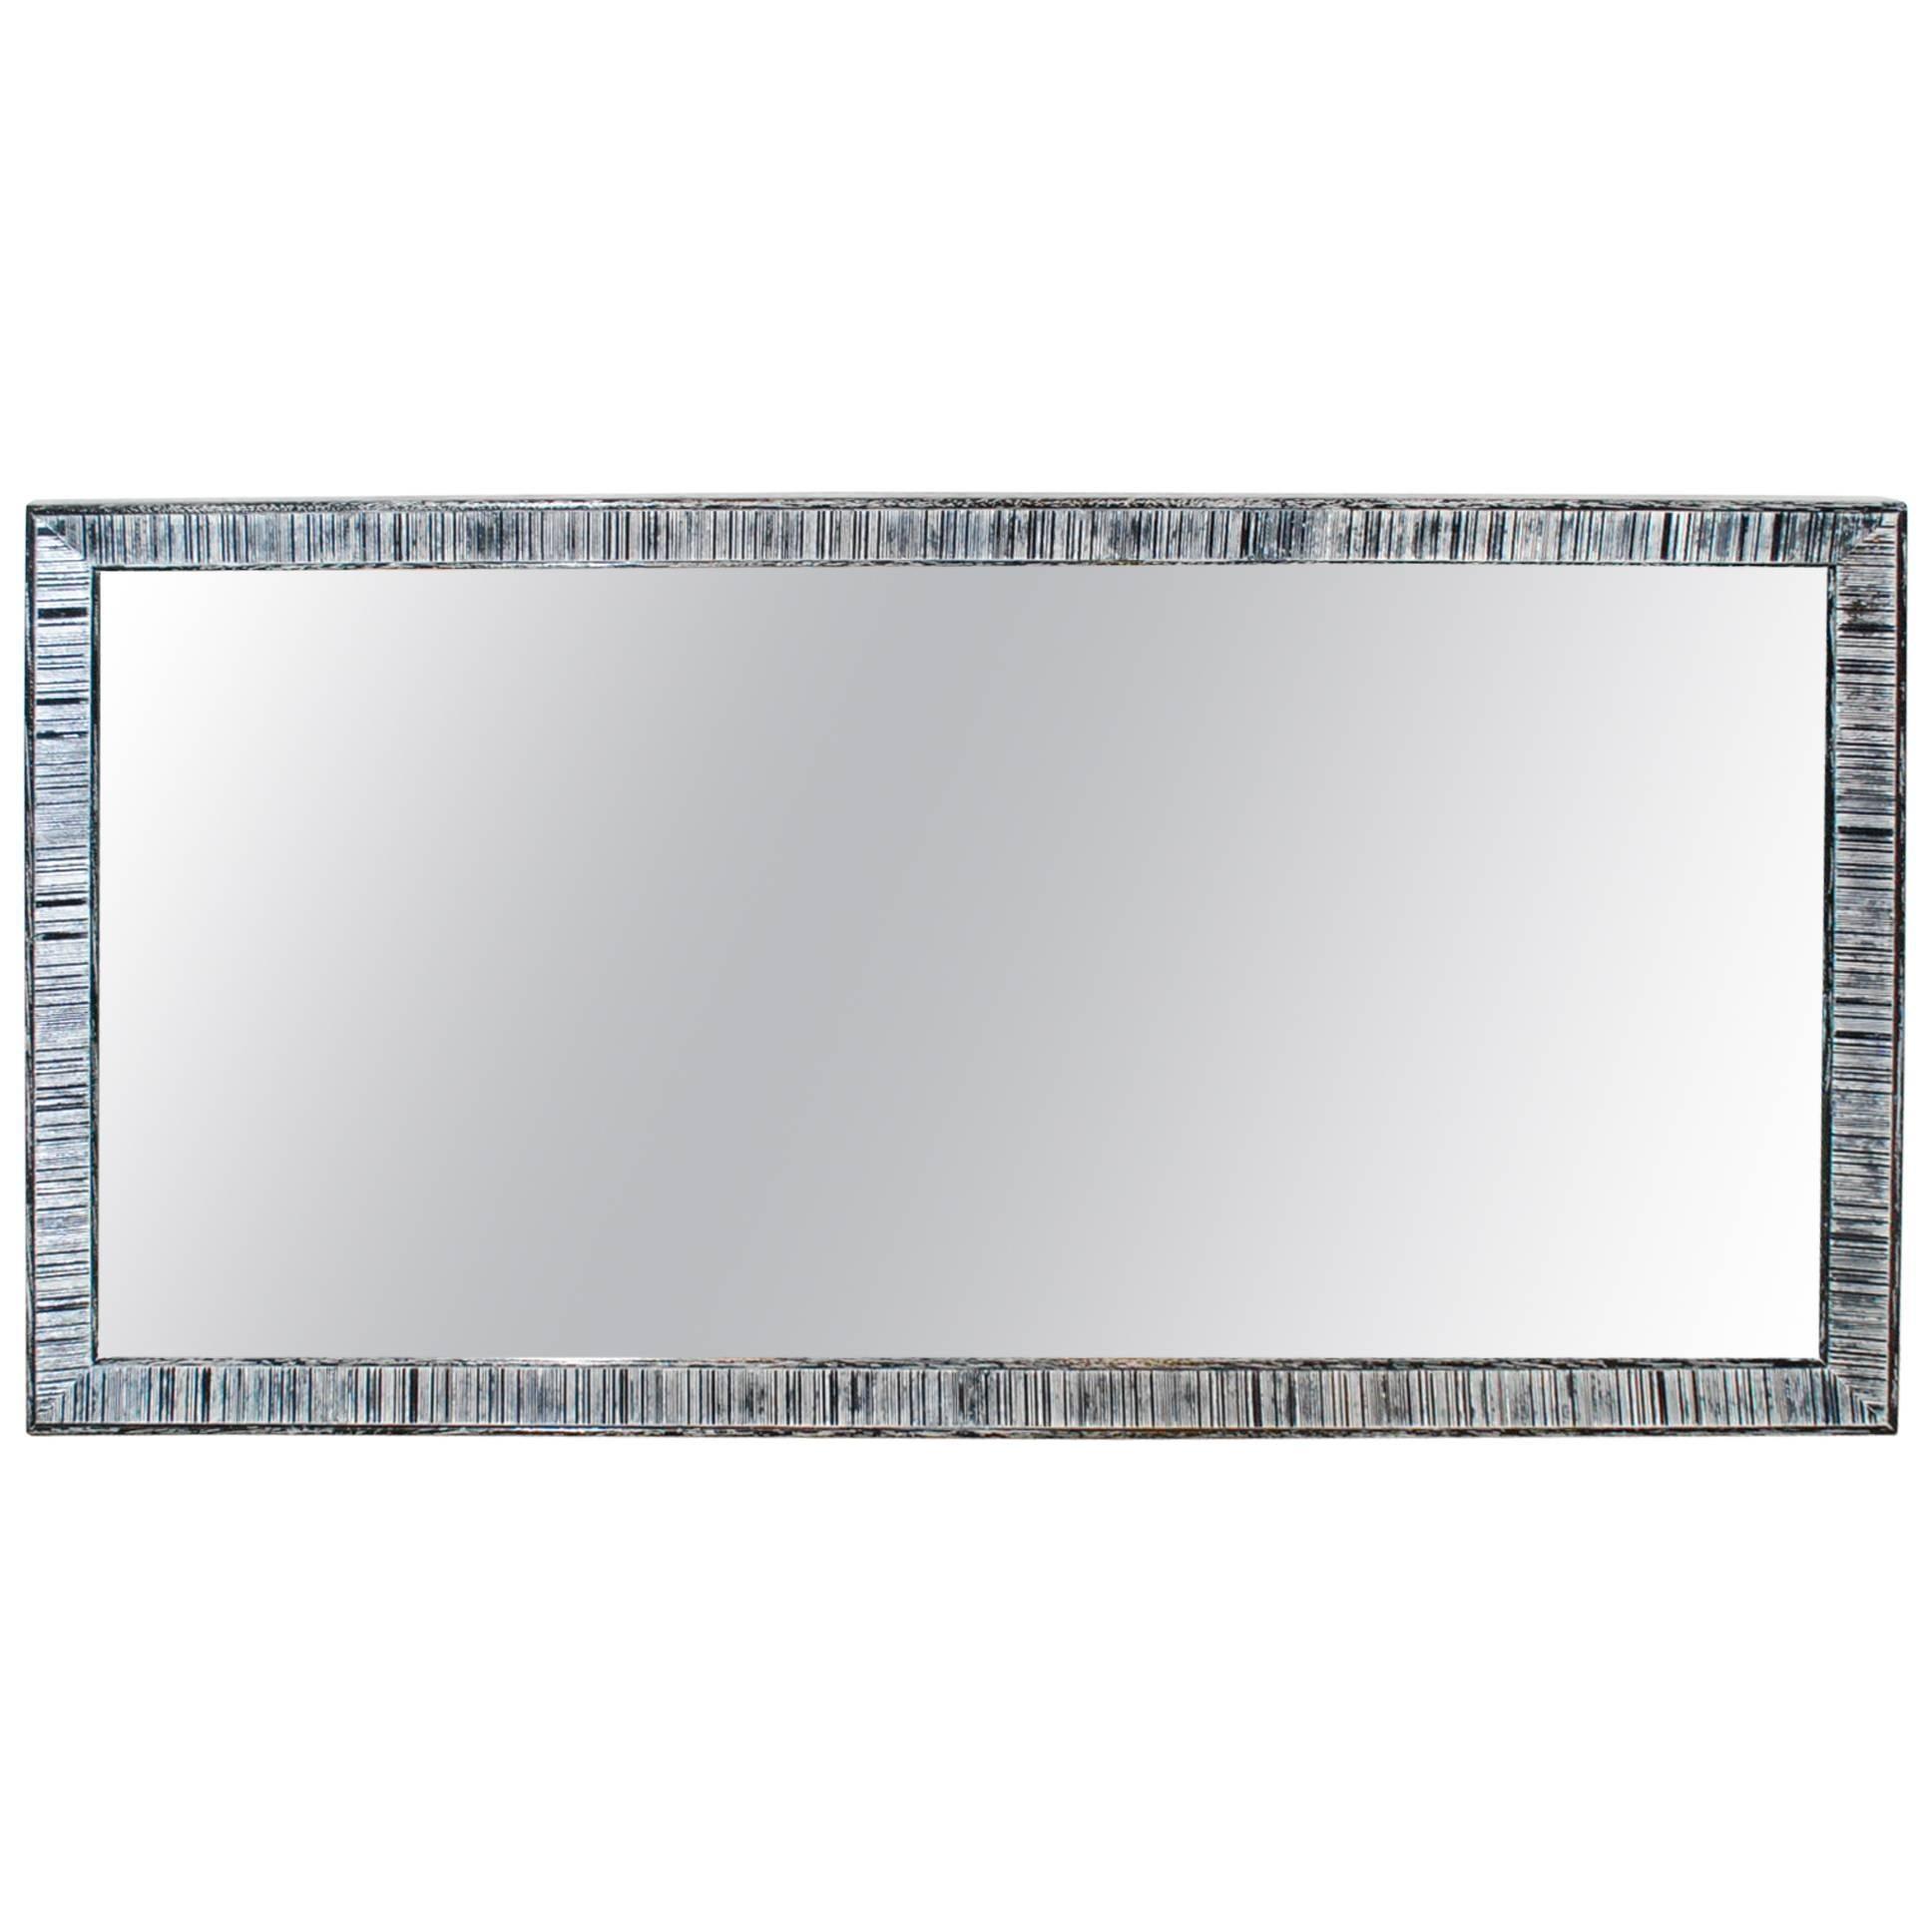 Paul Frankl for Brown Saltman Cerused Mirror